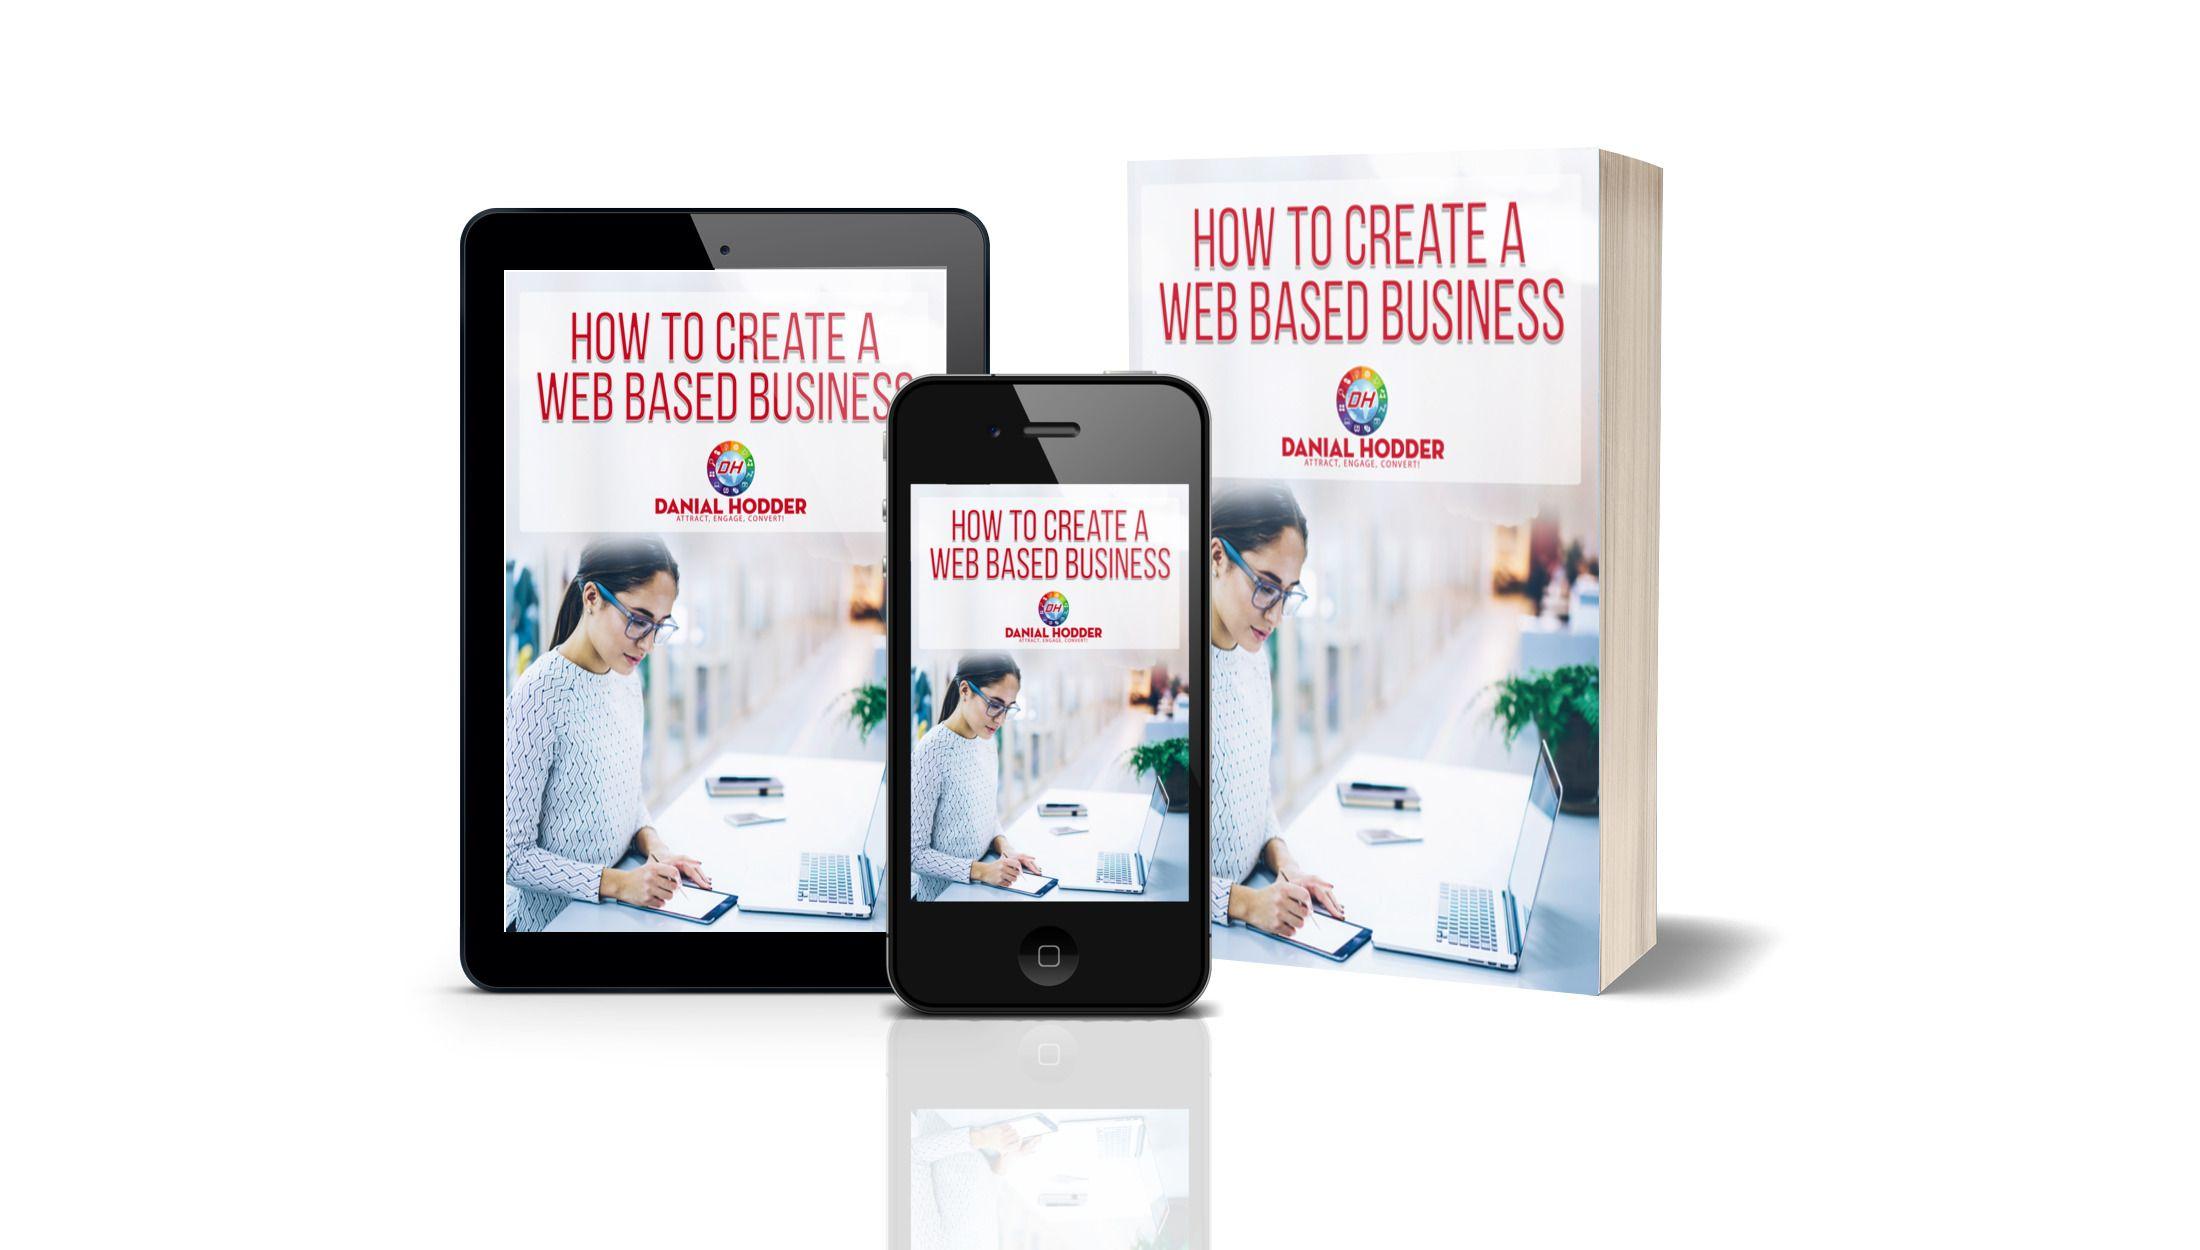 Danial Hodder Successful Web Based Business